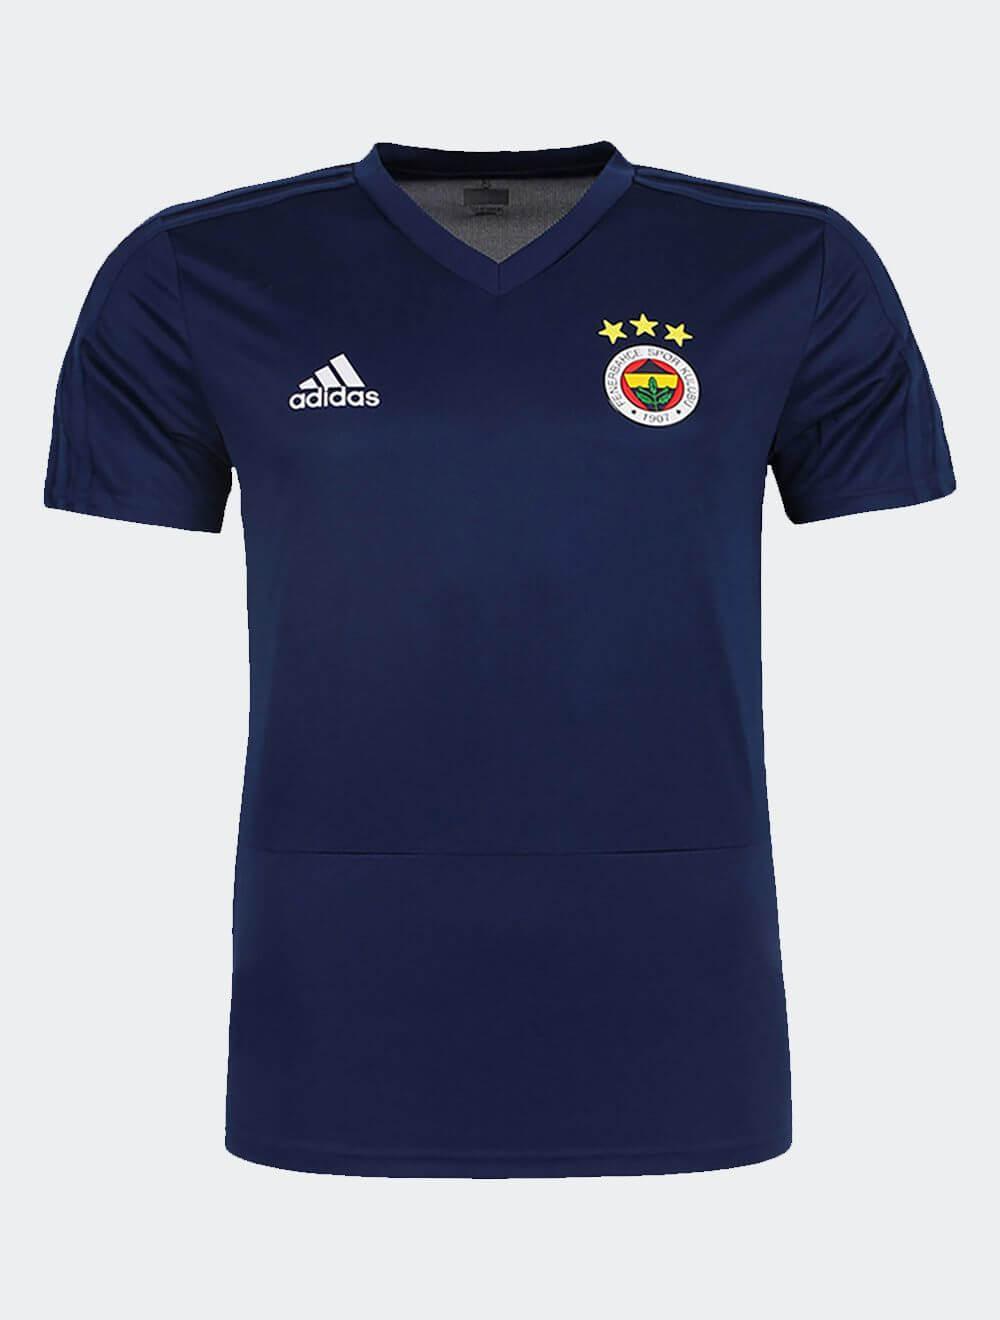 Çocuk Lacivert 18/19 Futbolcu Antrenman T-Shirt